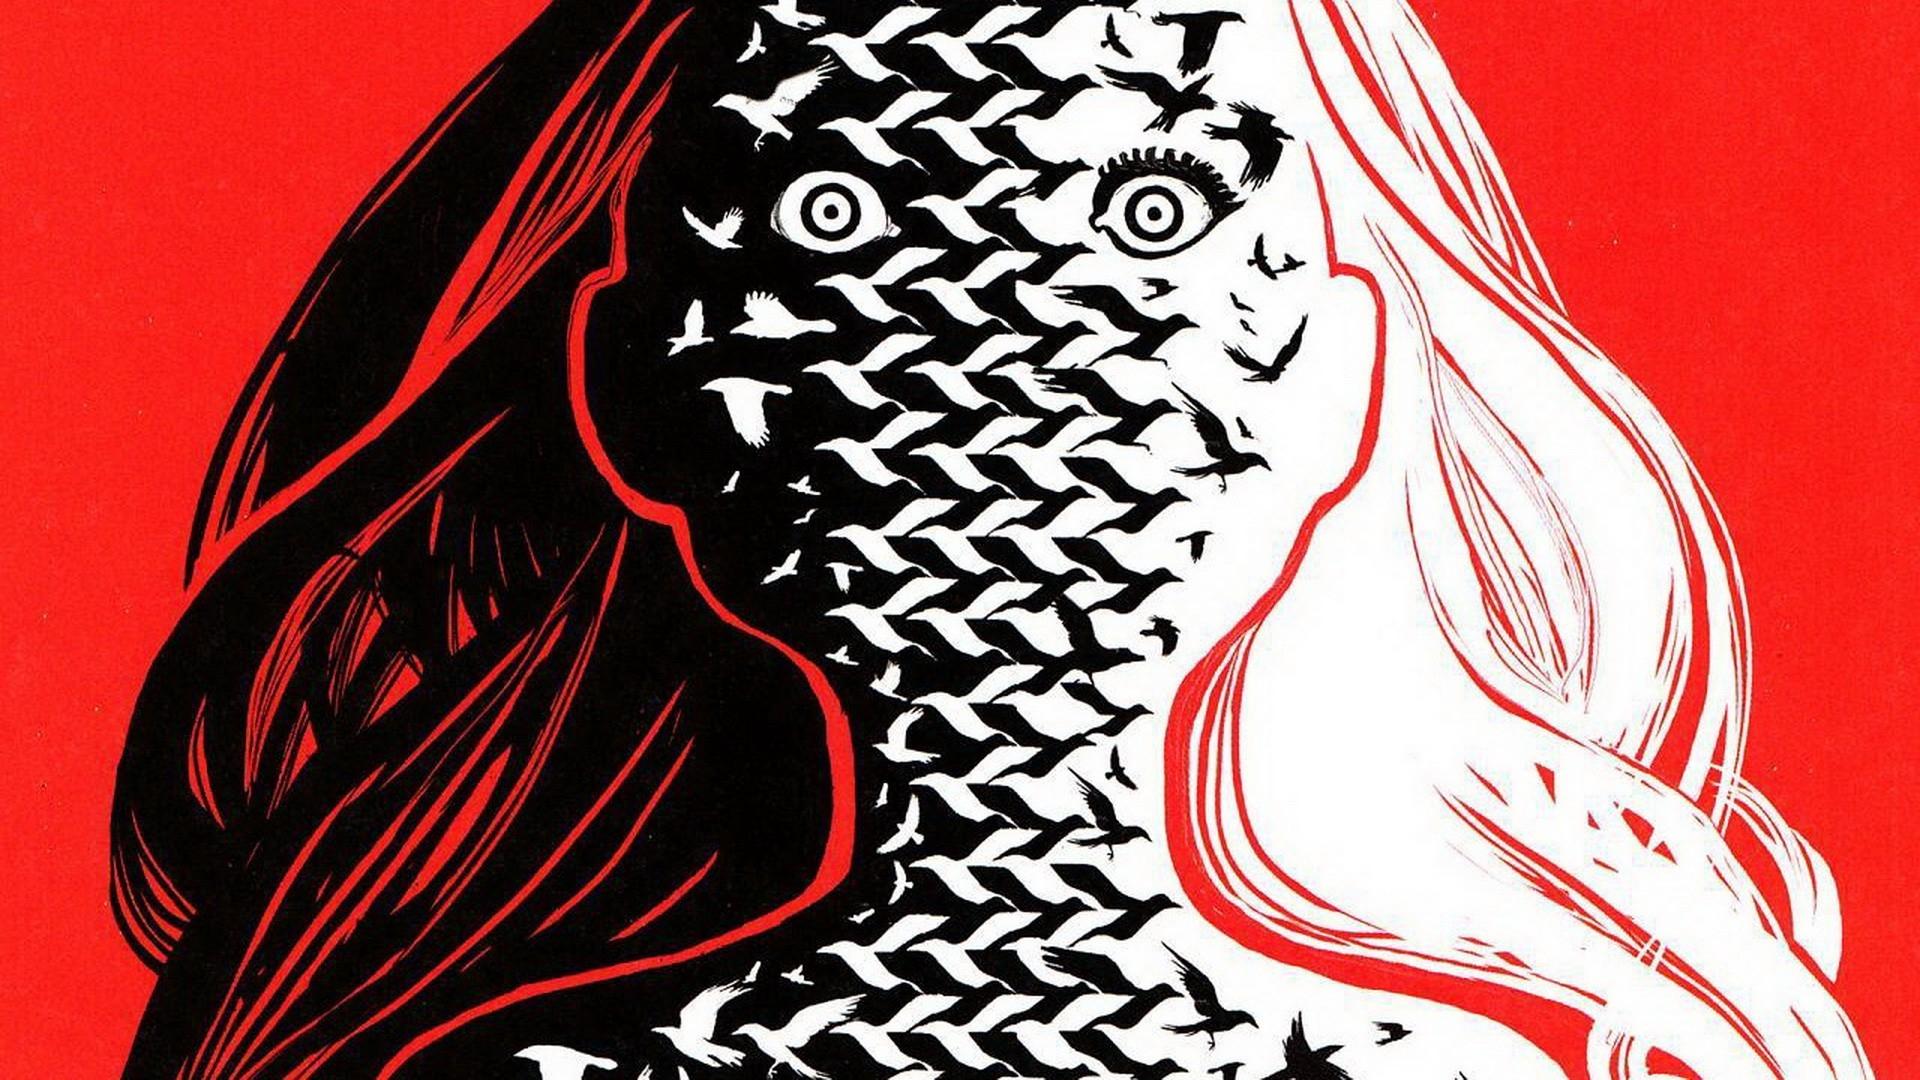 Beautiful Wallpaper Marvel Face - face-hair-girl-surrealism-fantasy-1053943  Trends_479484.jpg